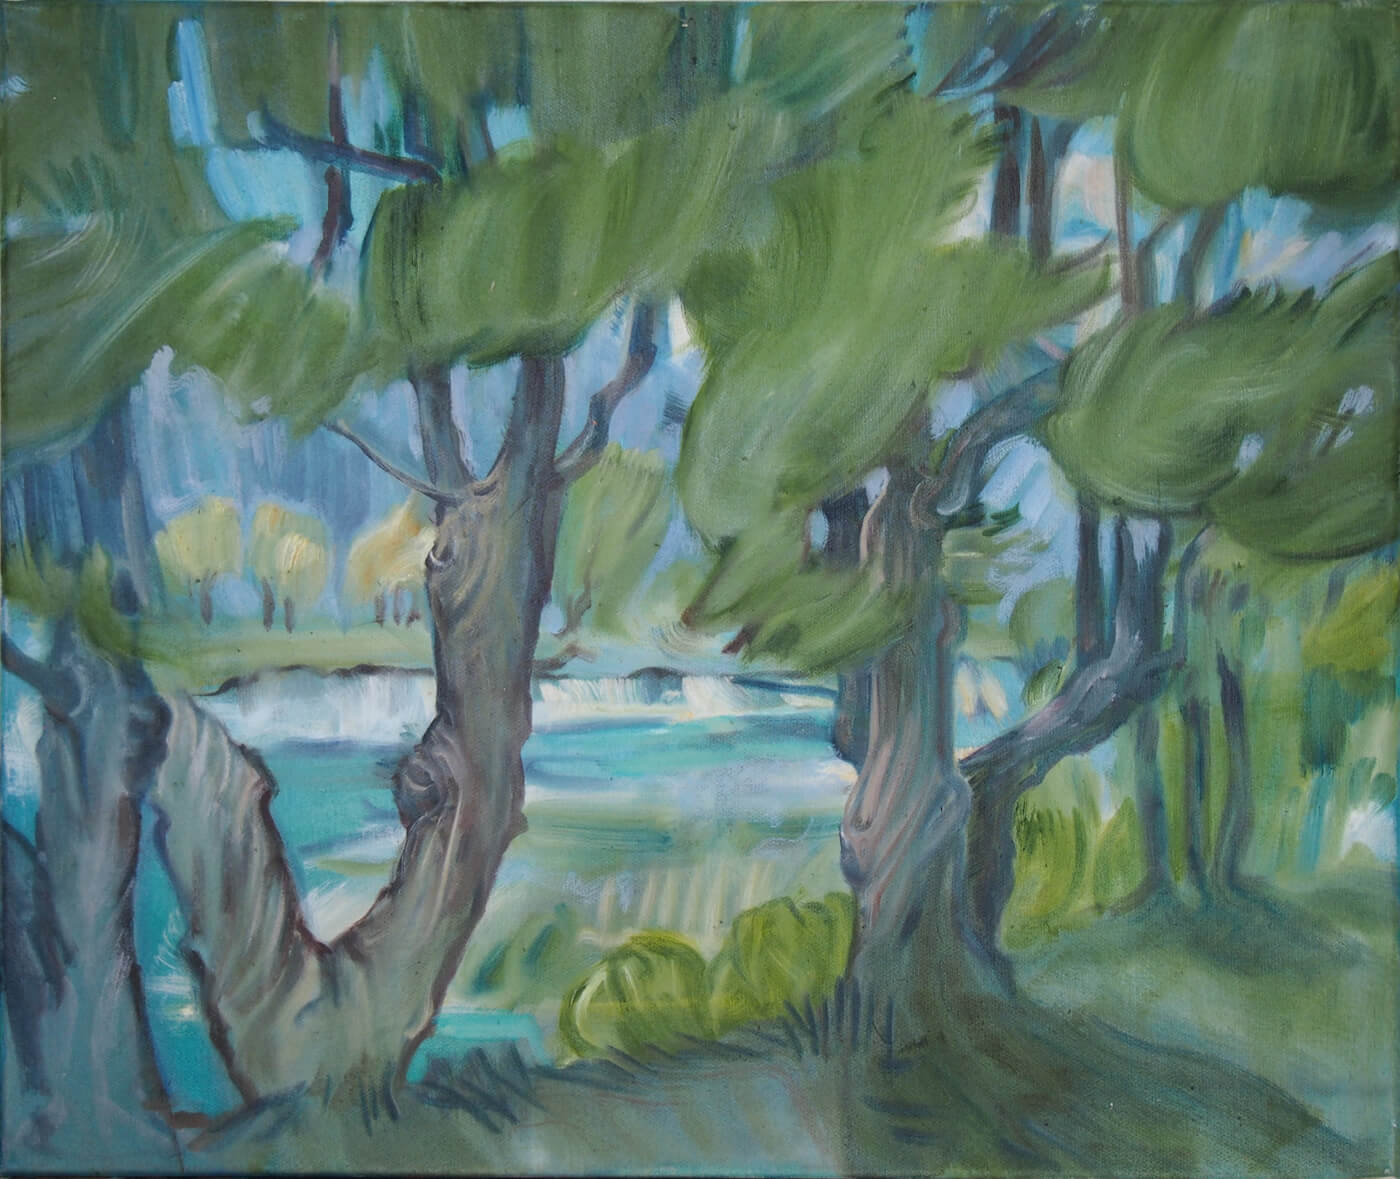 Landschaftsmalerei, en plein air, Freilichtmalerei, Bäume, Öl auf Leinwand, Tanja Leodolter, Künstlerin